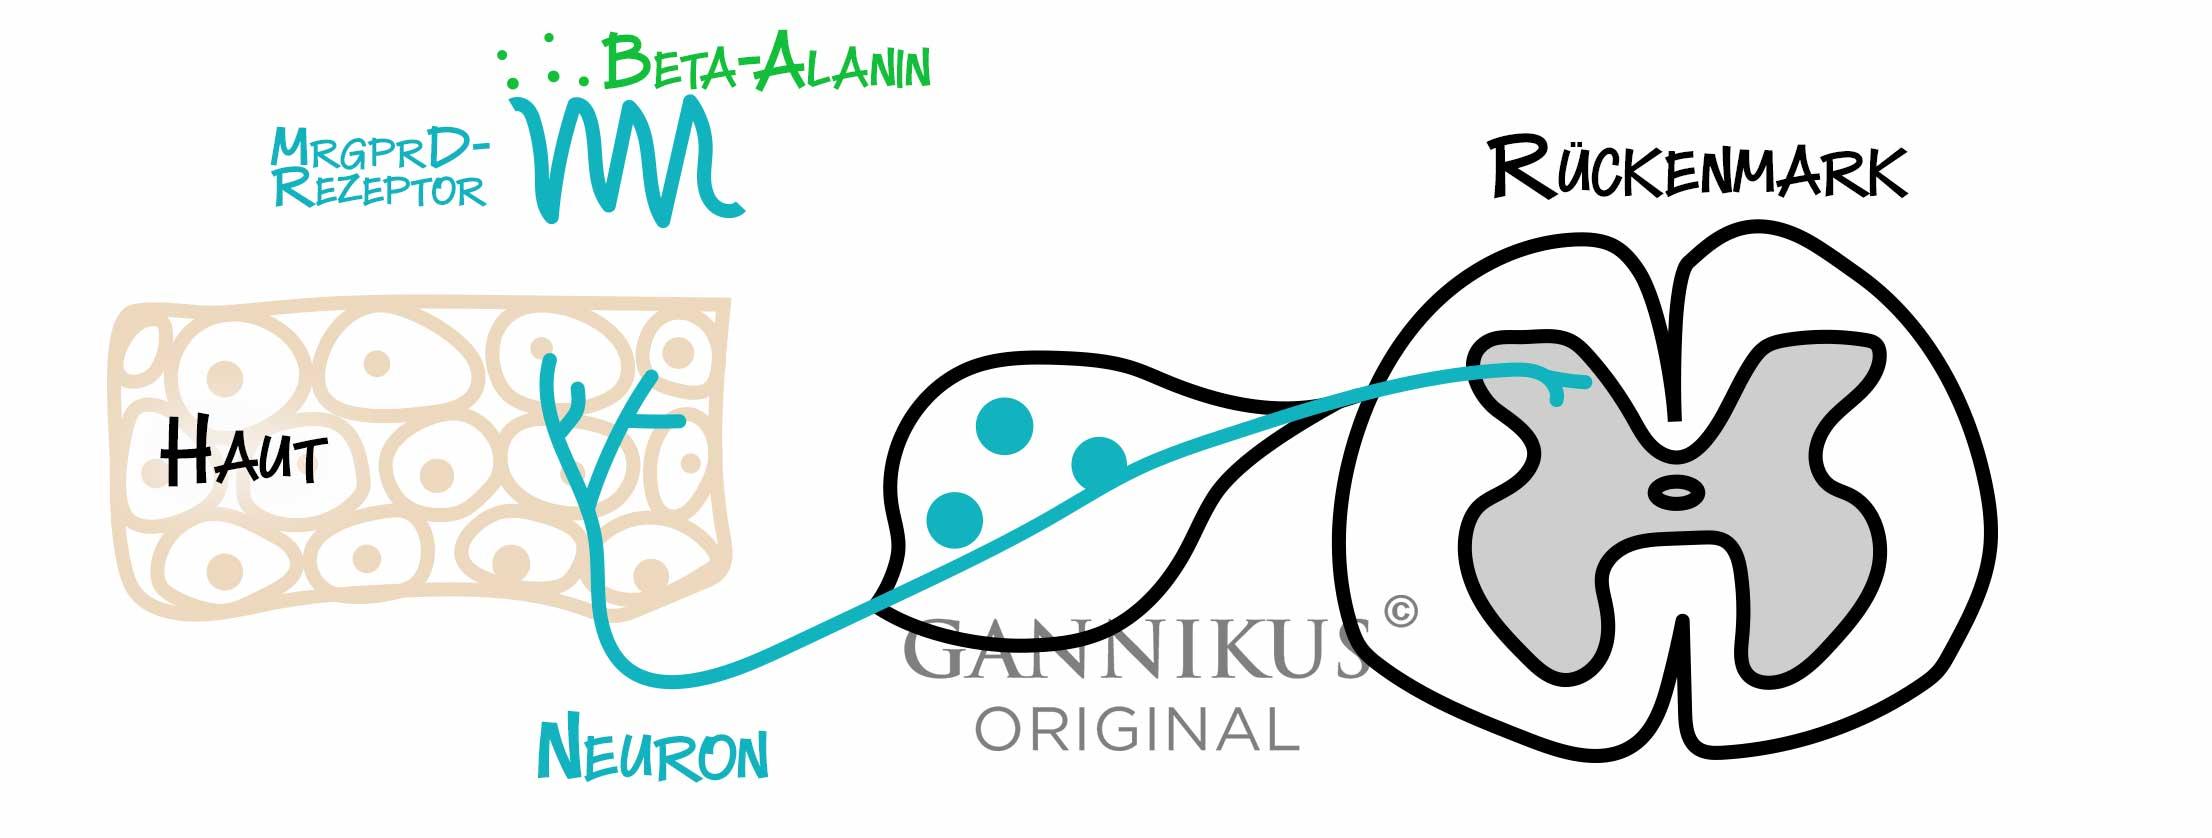 MrgprD-Rezeptor Beta-Alanin